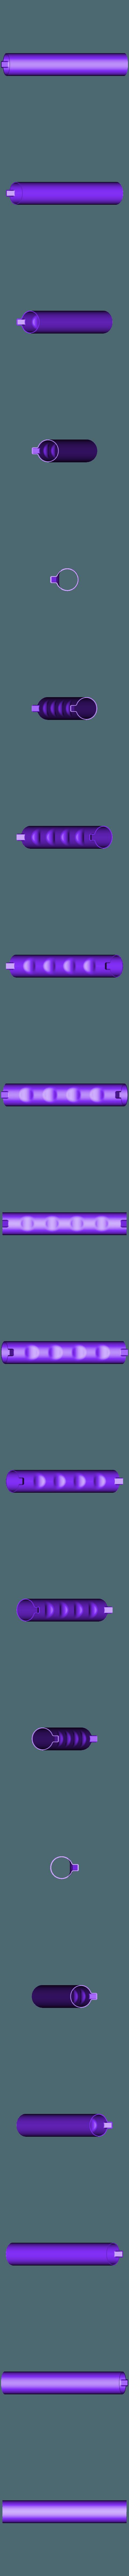 PanierRecyclage - Poignee.stl Télécharger fichier STL gratuit Panier recyclage • Objet imprimable en 3D, mrballeure